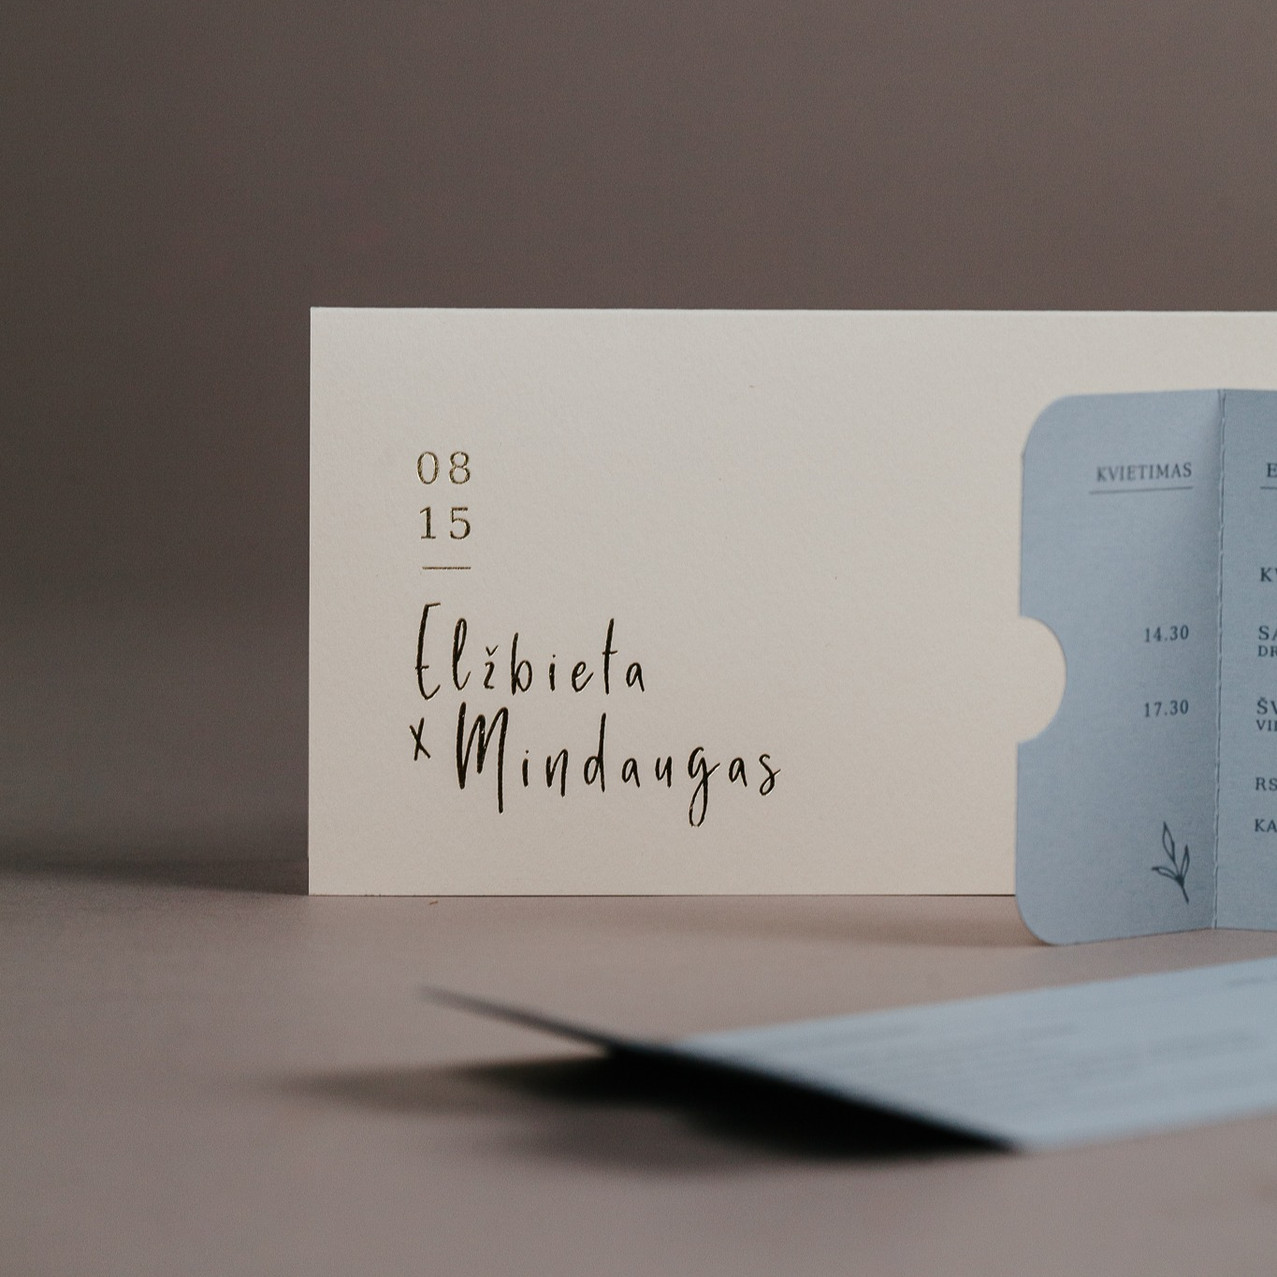 vestuviniai kvietimai laimes bilietas br